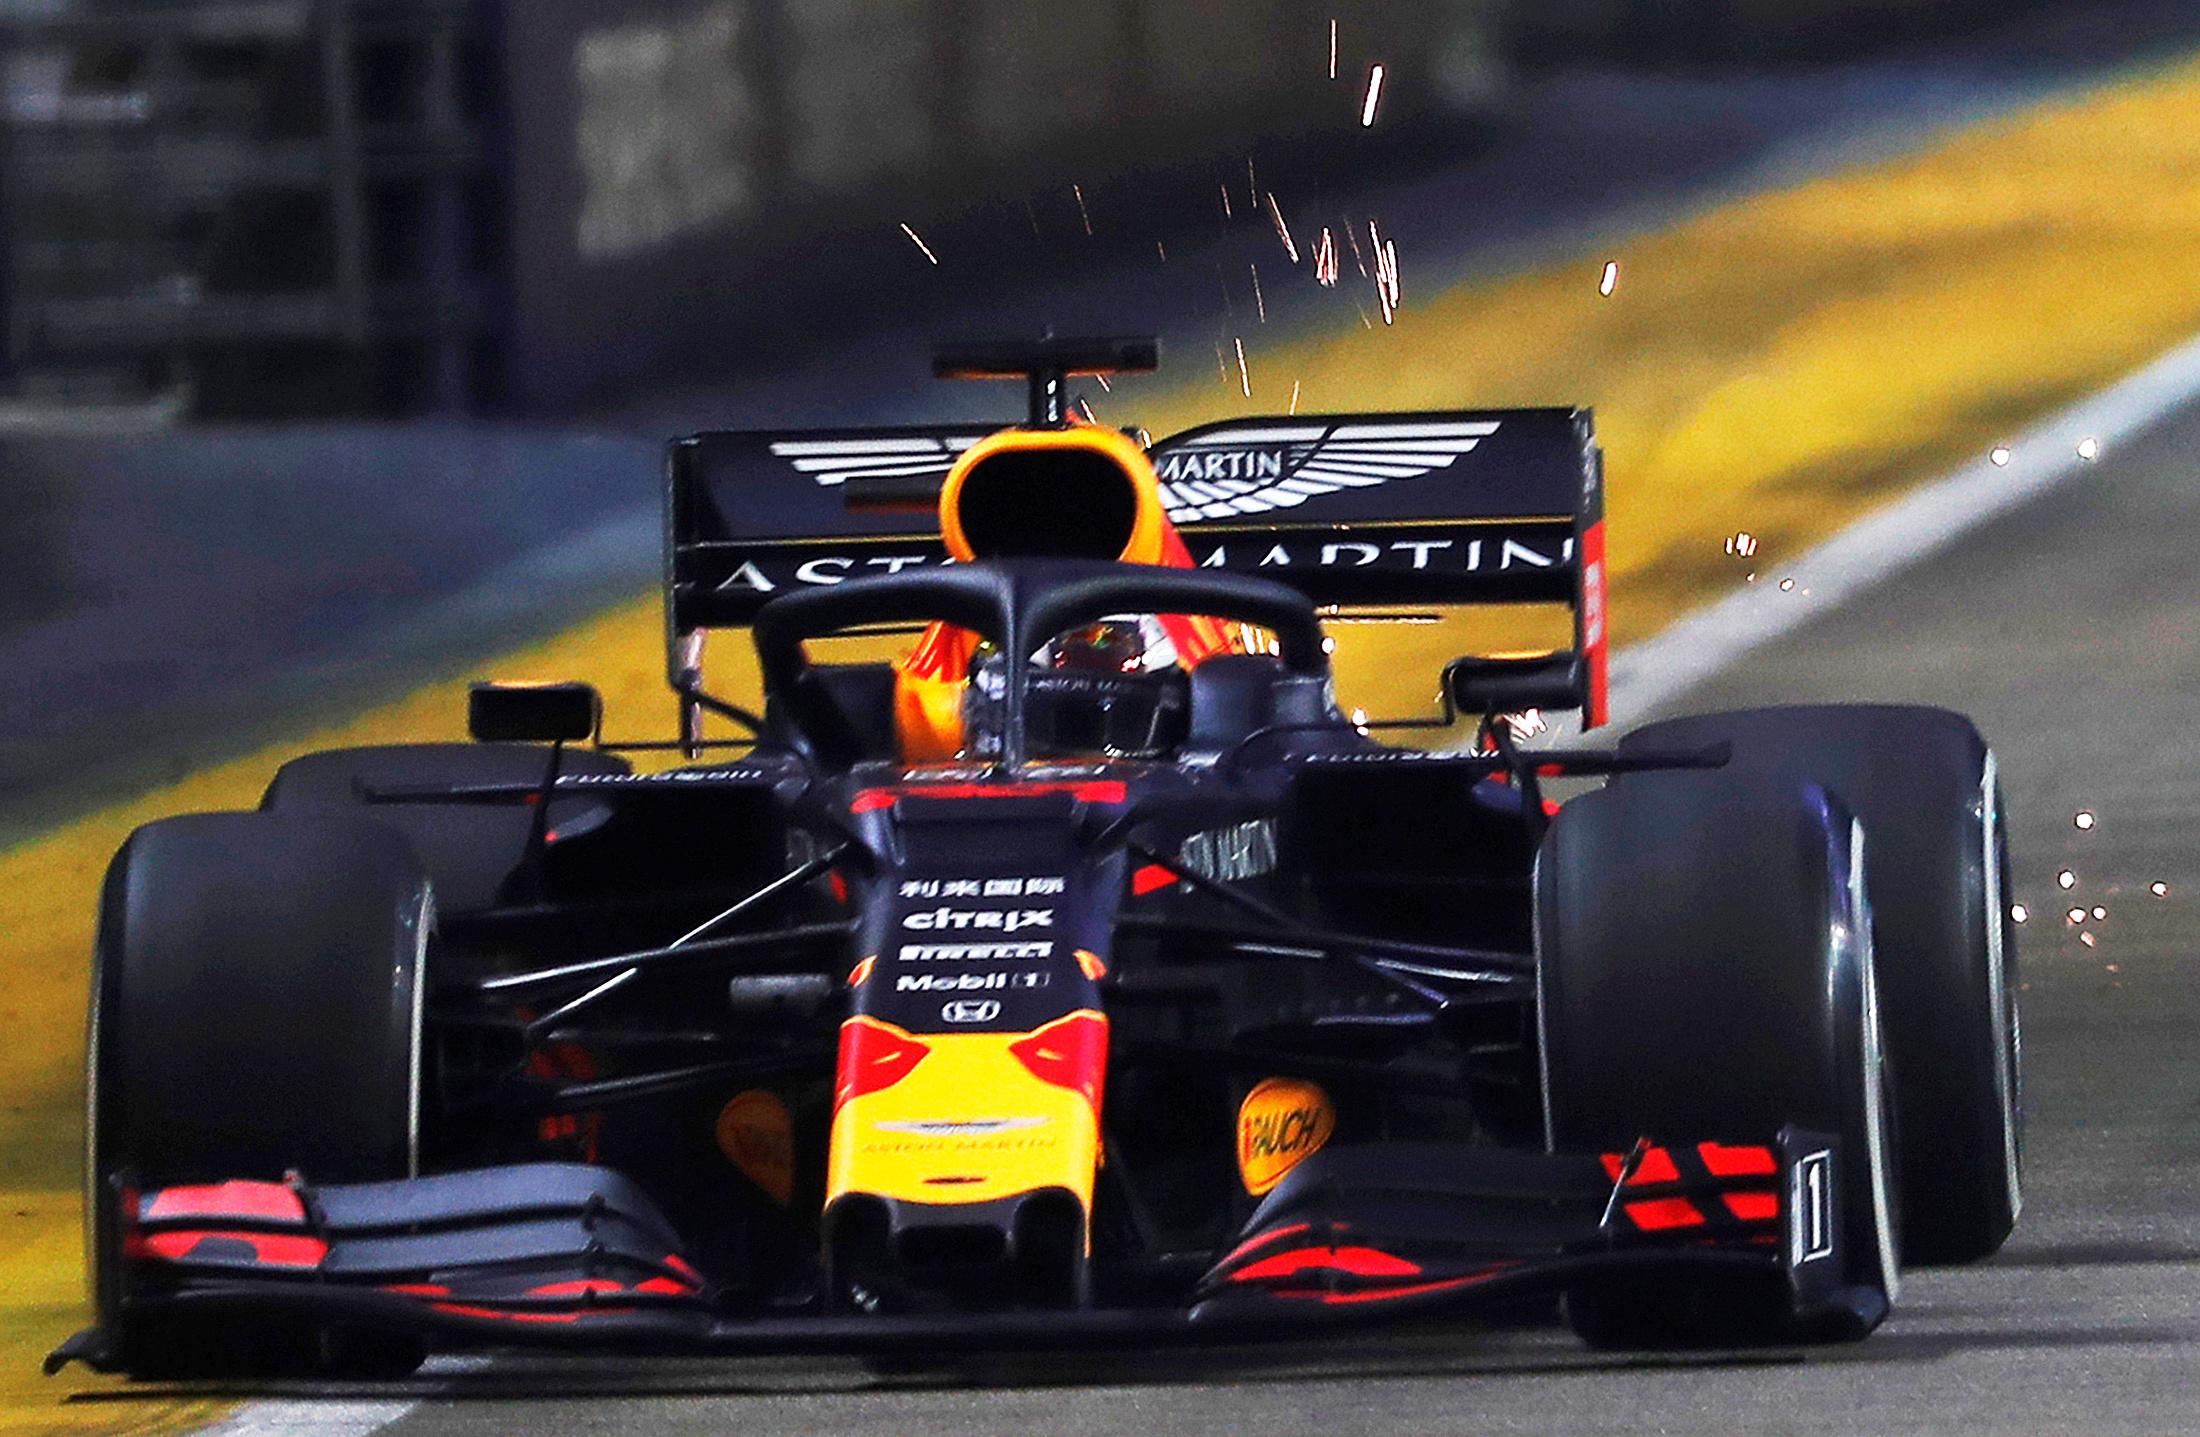 Motor racing: Hamilton edges Verstappen in Singapore practice